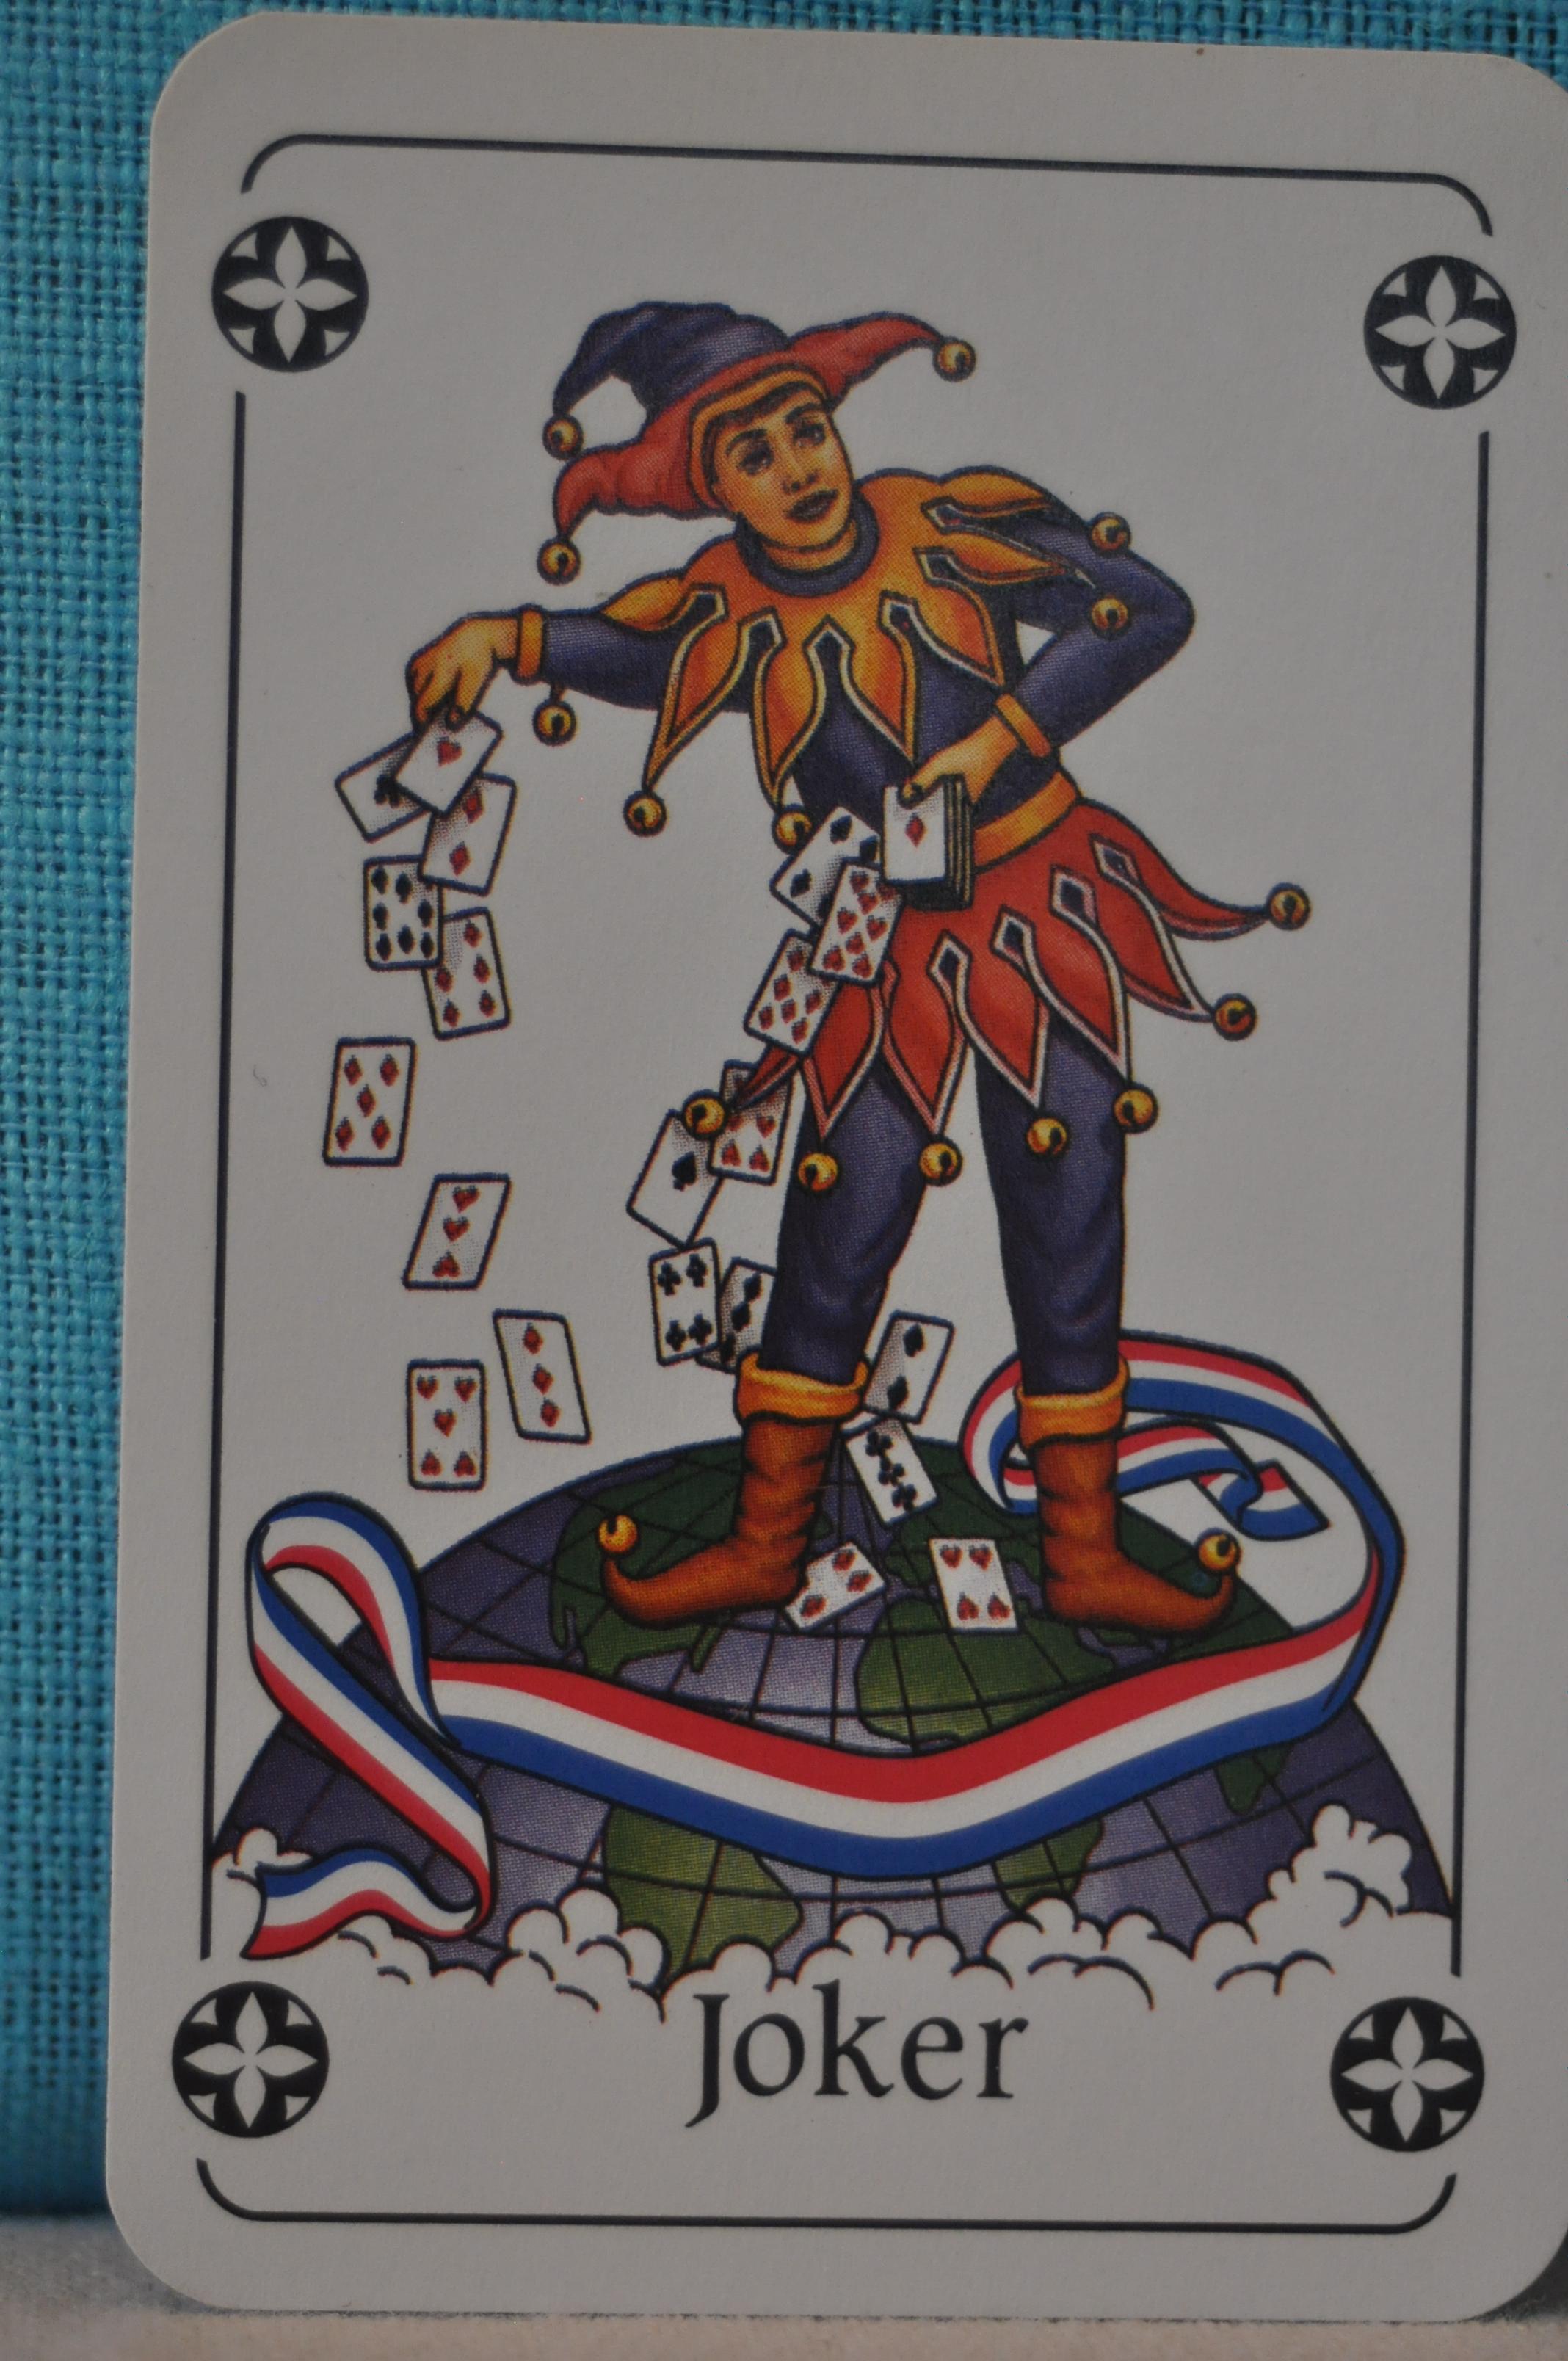 Джокер — википедия с видео // wiki 2